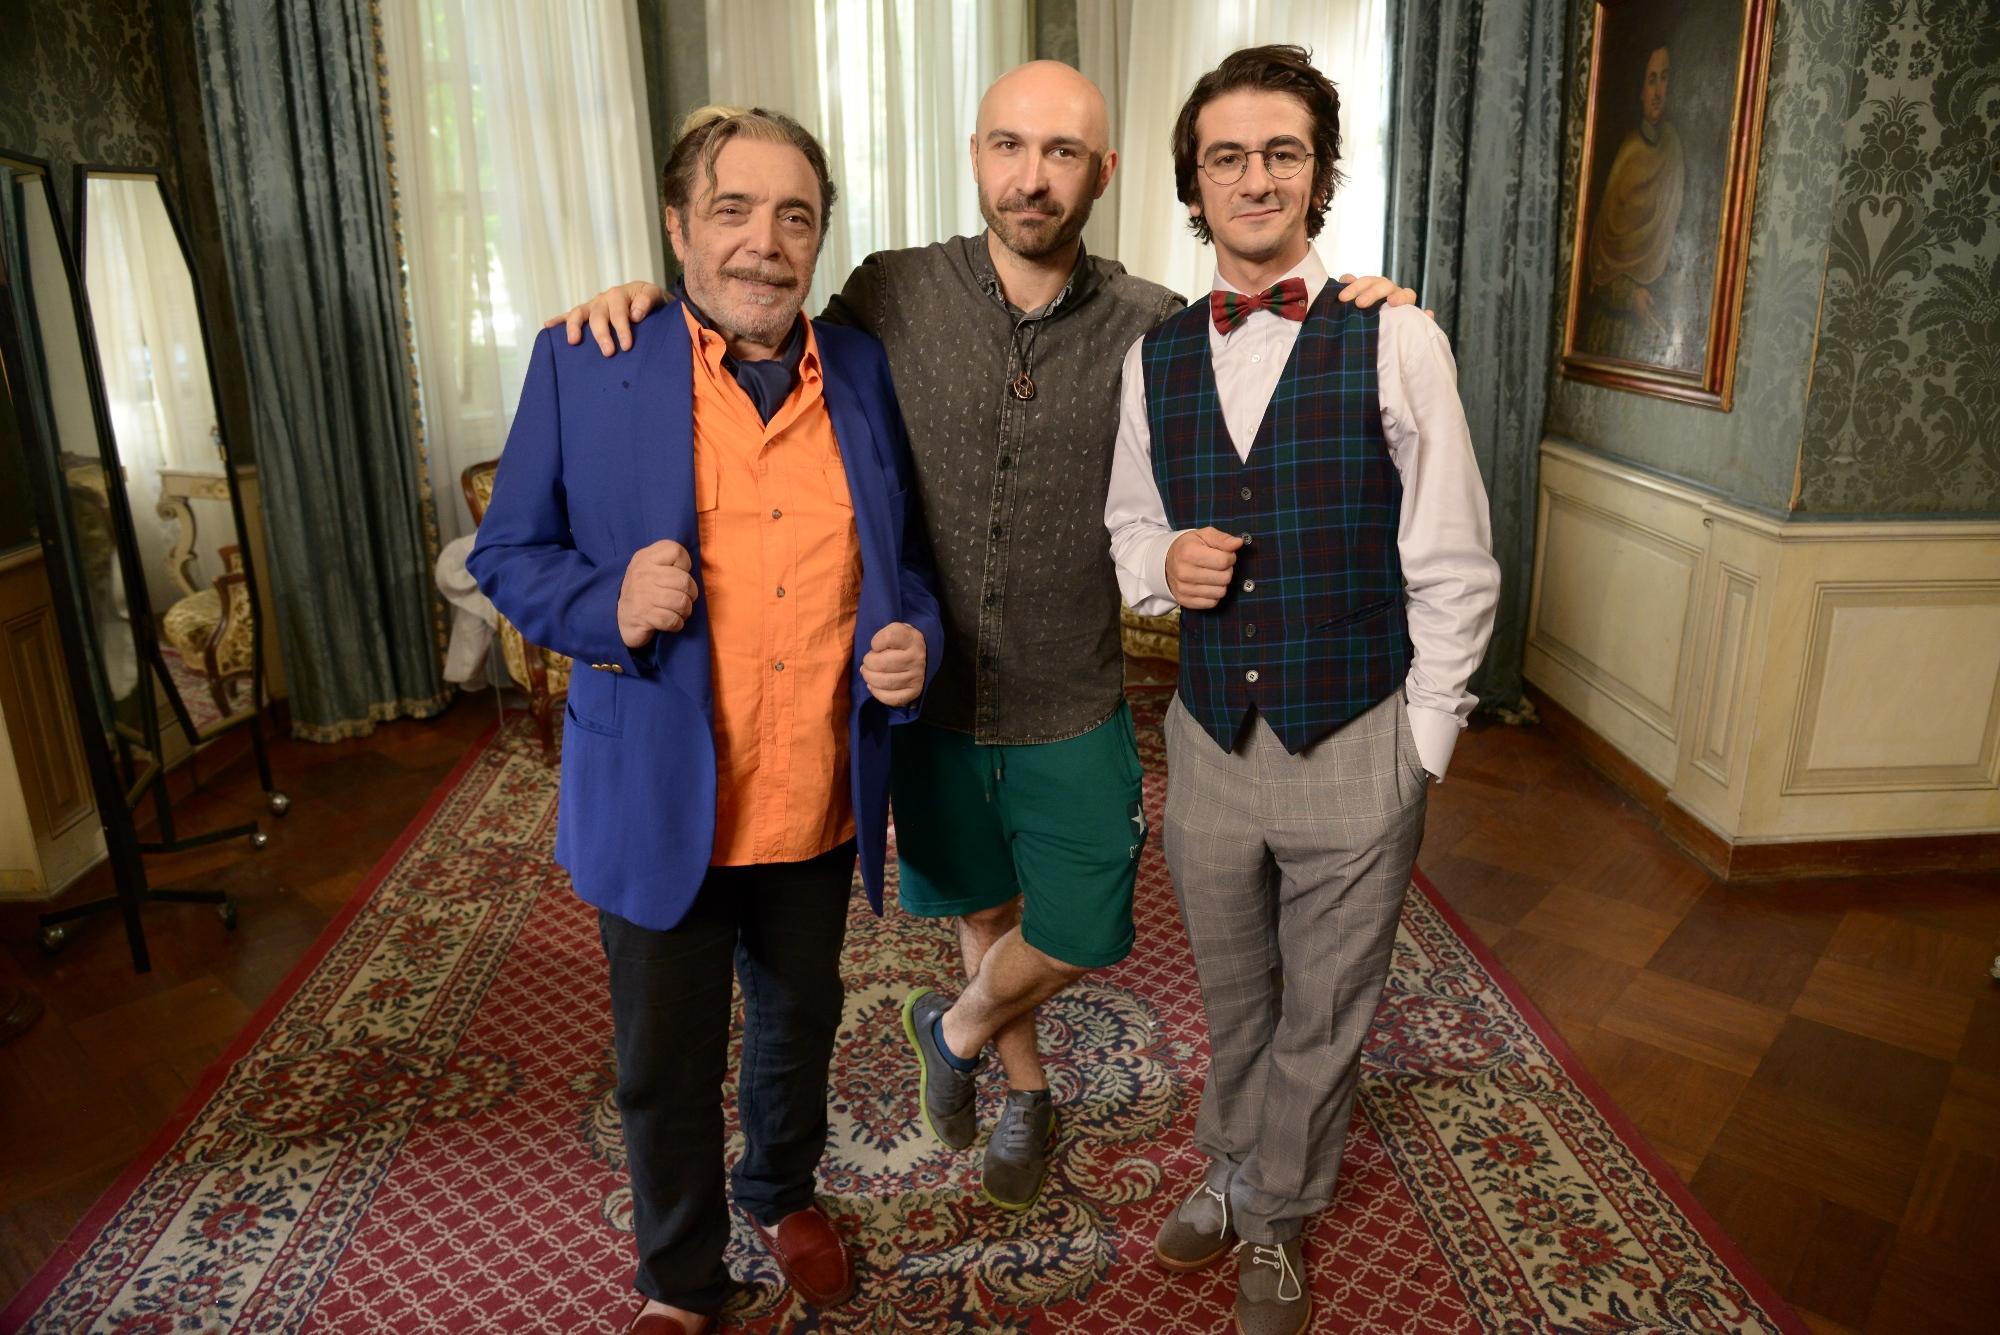 Mariottide Infinity Italia 1, domani due episodi in anteprima: le ultimissime